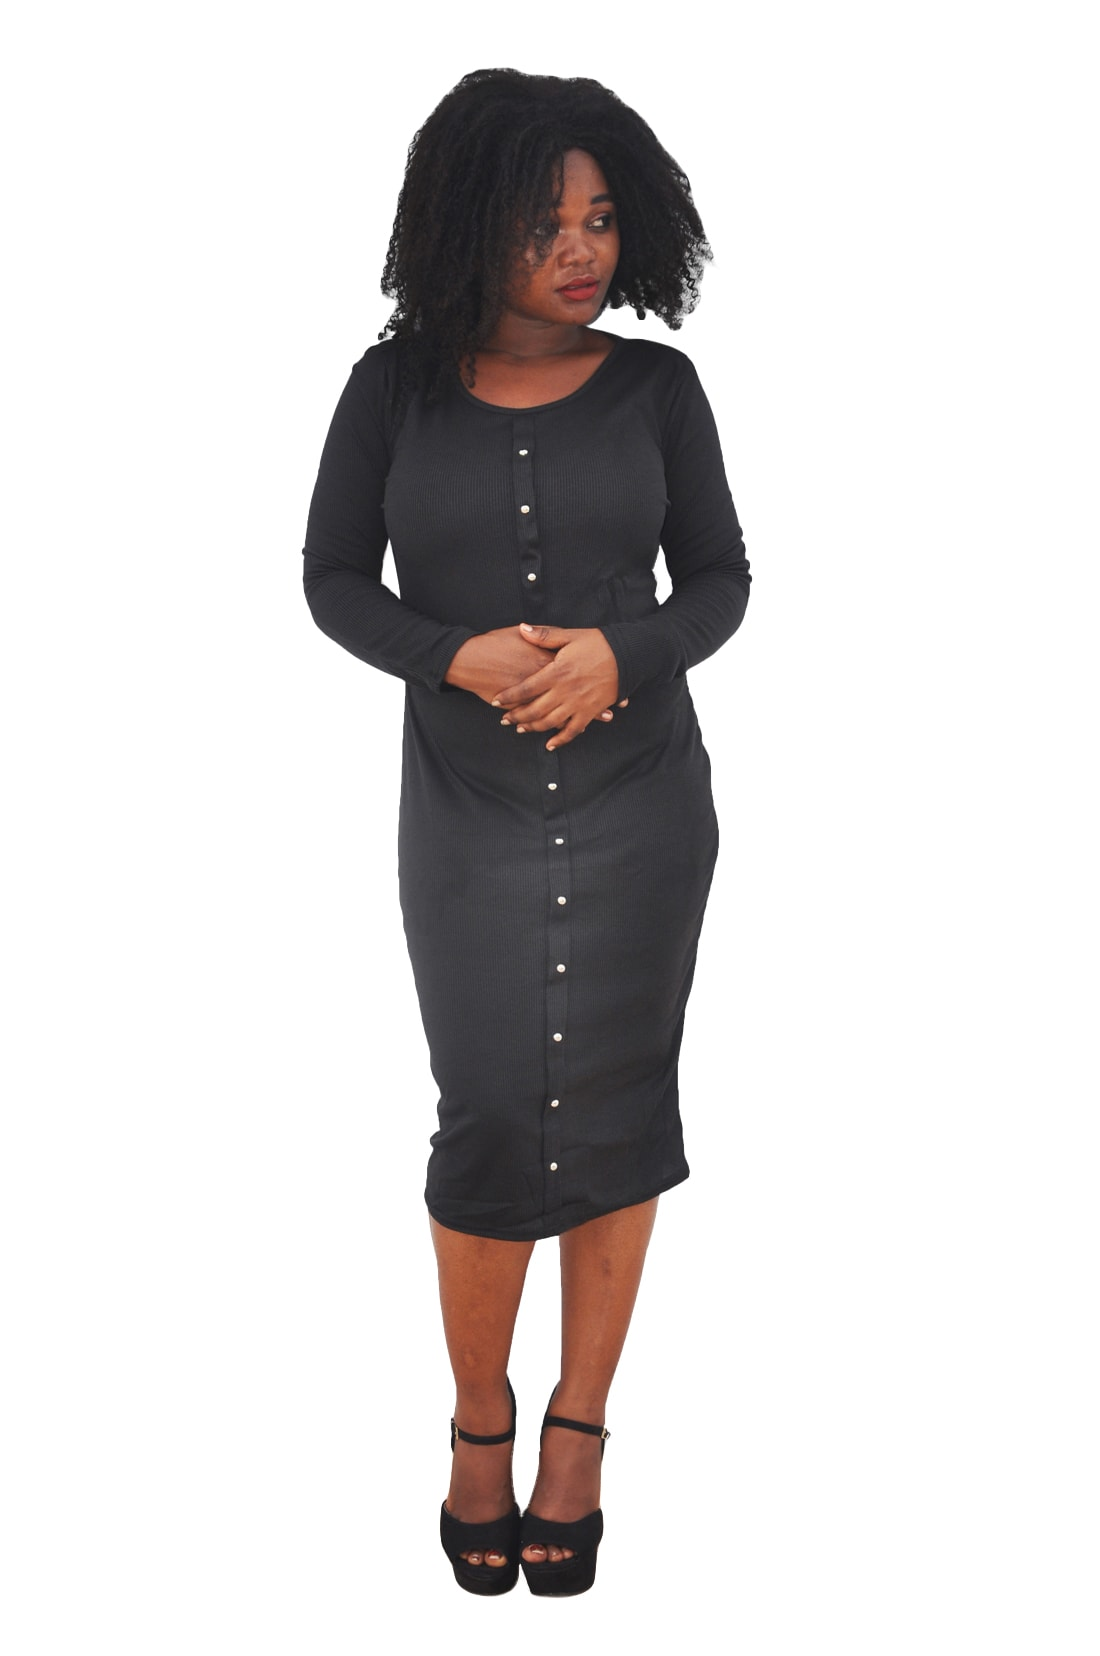 M0253 black1 Office Evening Dresses maureens.com boutique